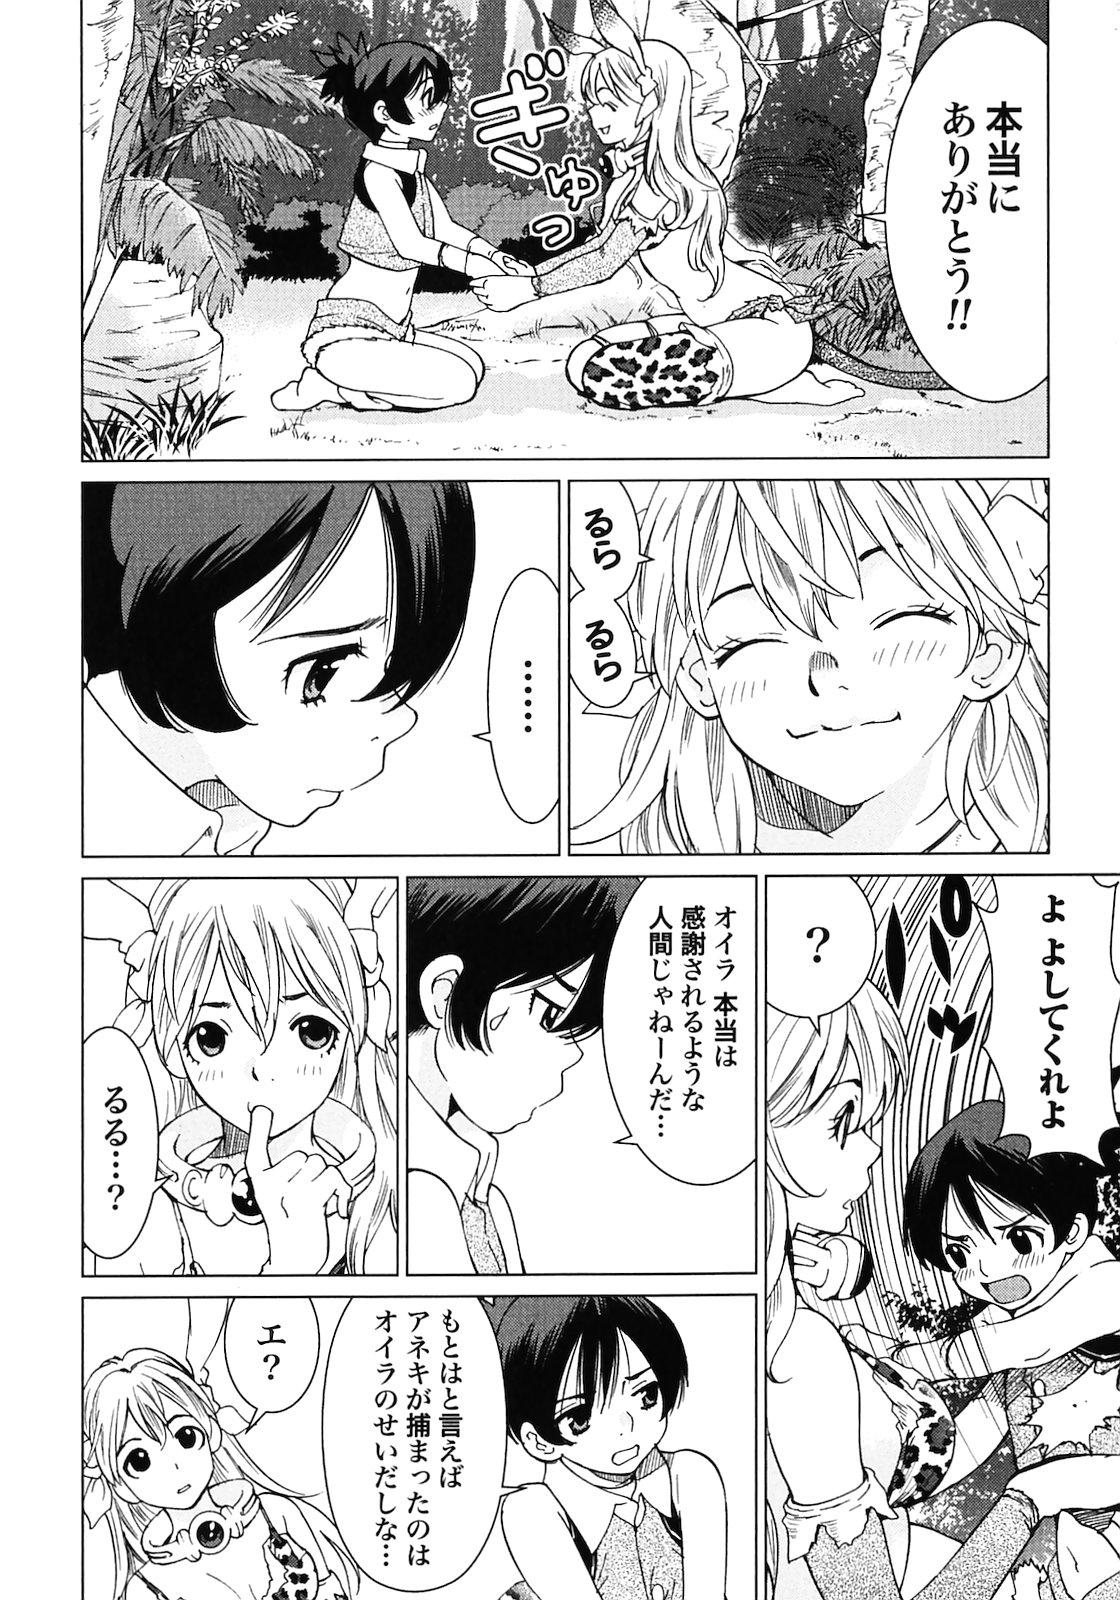 Makyo no Shanana Vol.02 179